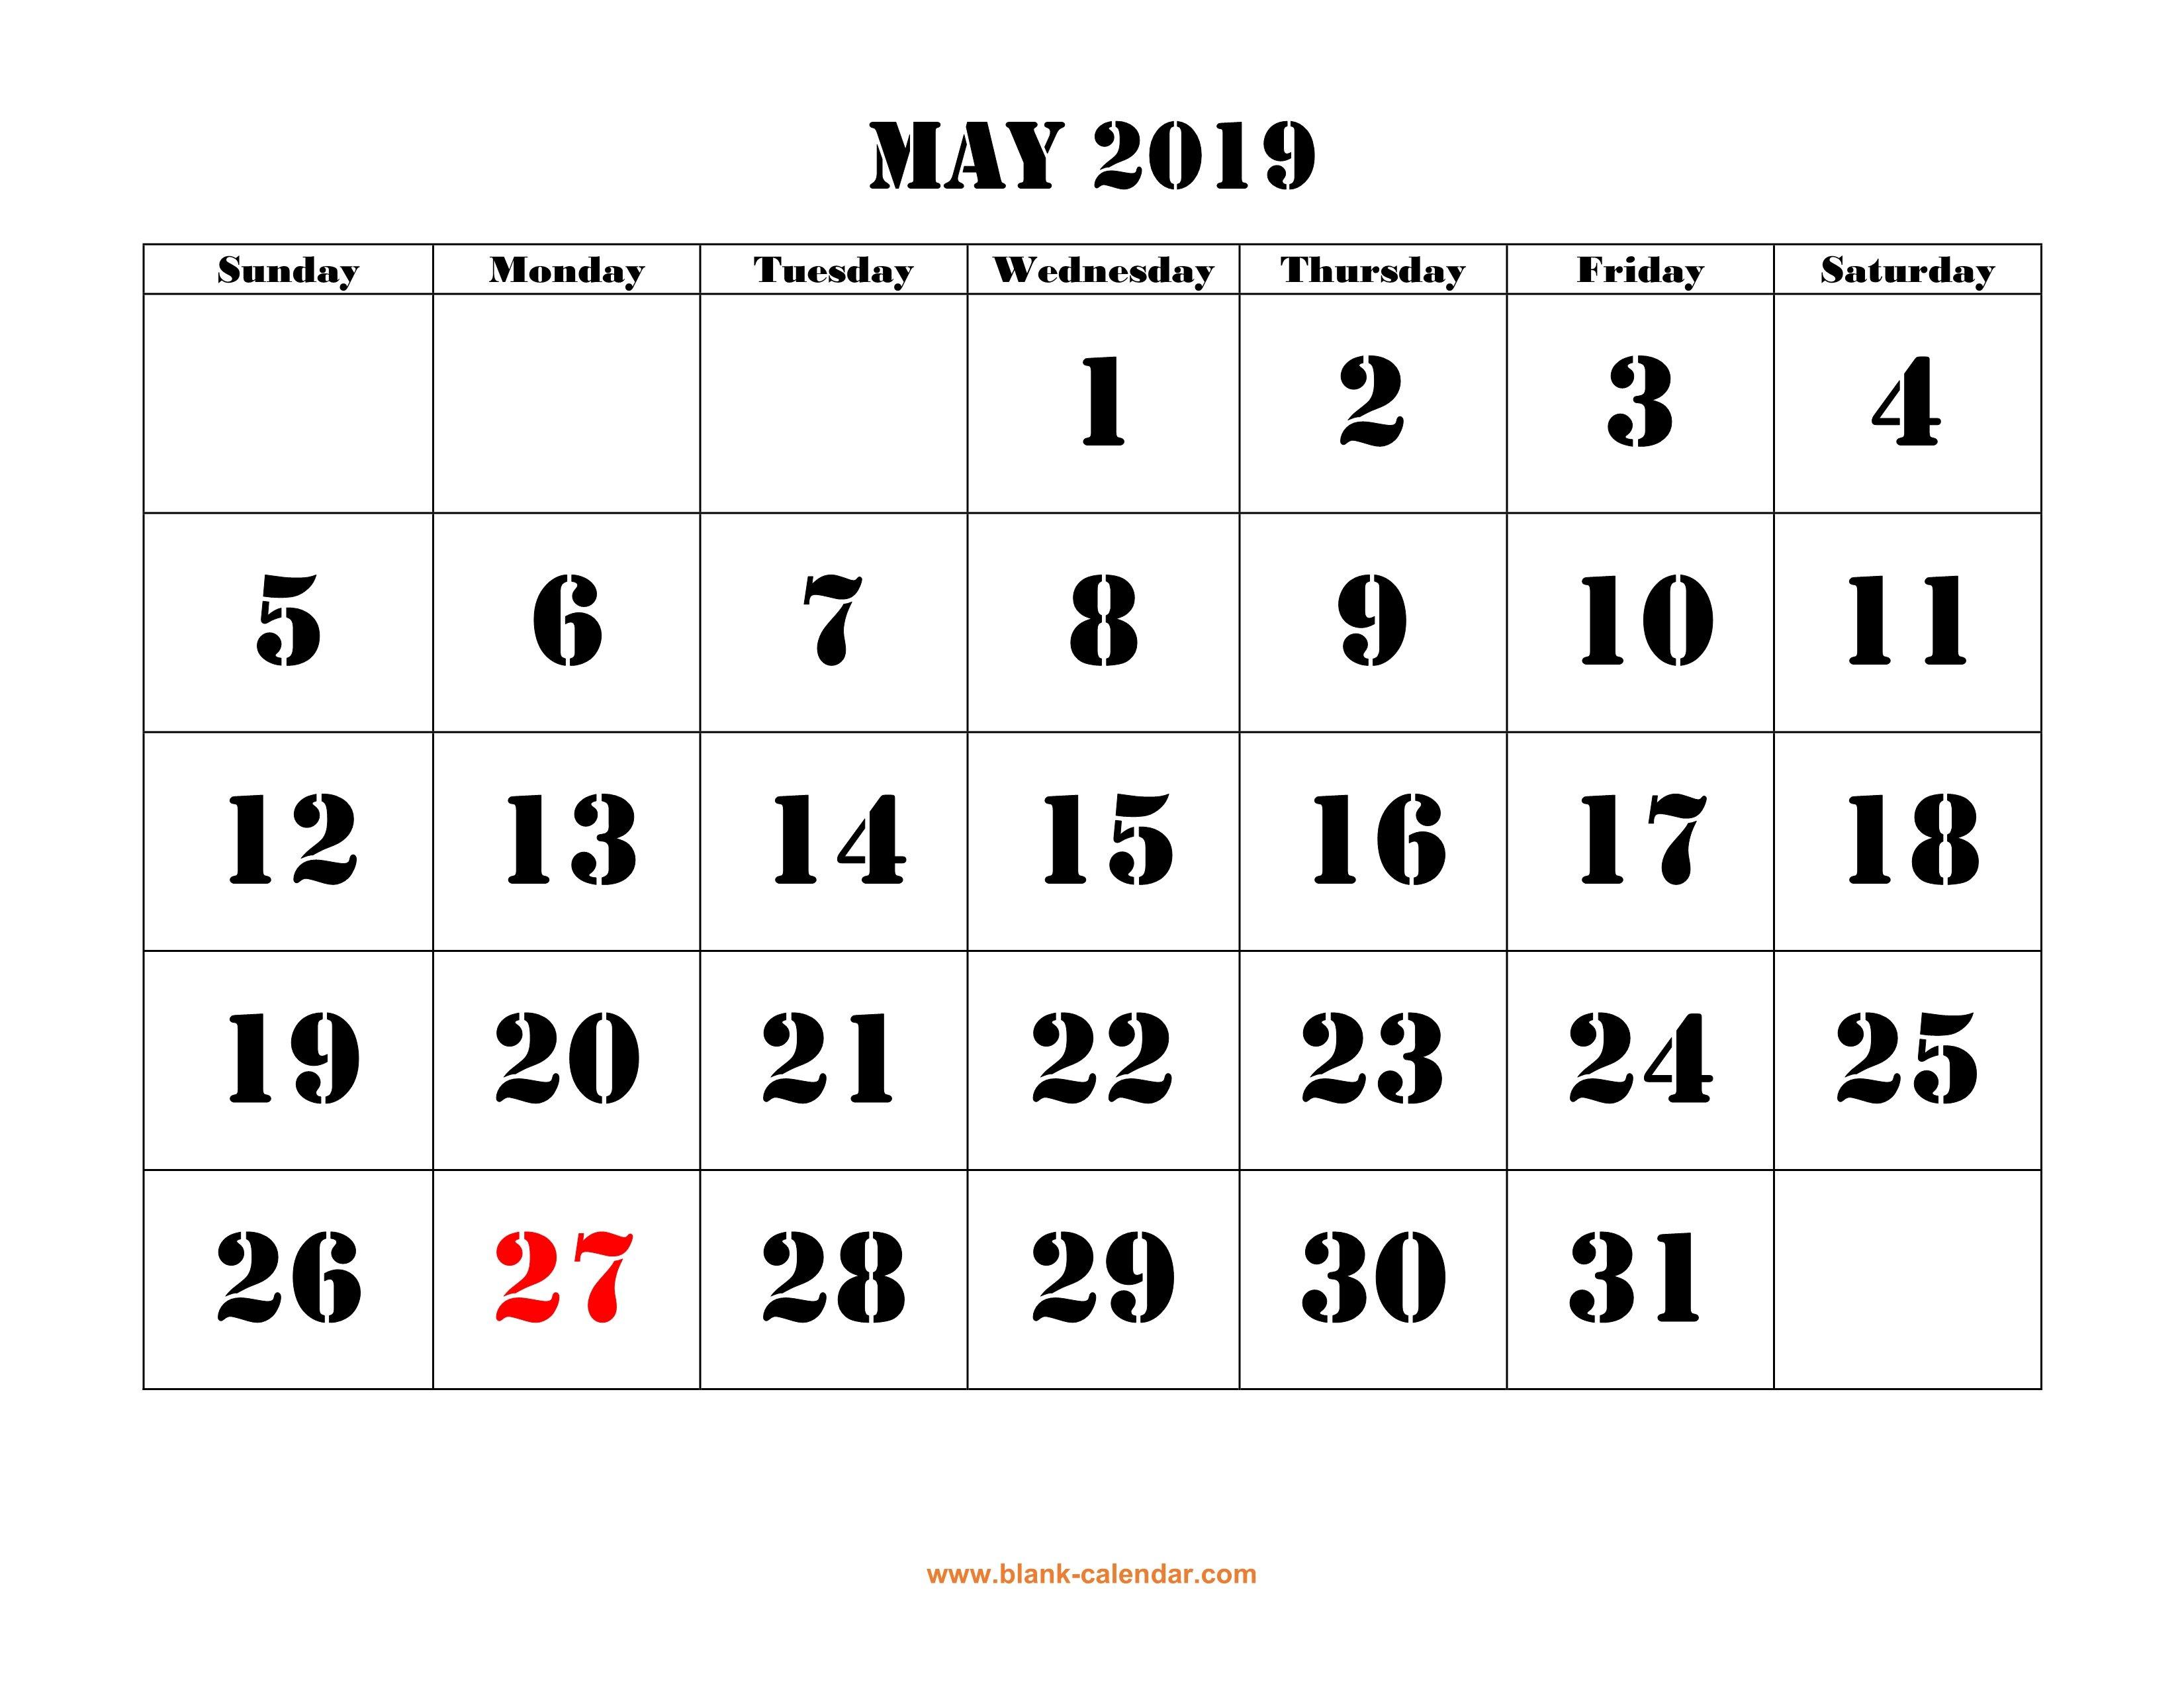 Free Download Printable May 2019 Calendar, Large Font Design May 2 2019 Calendar